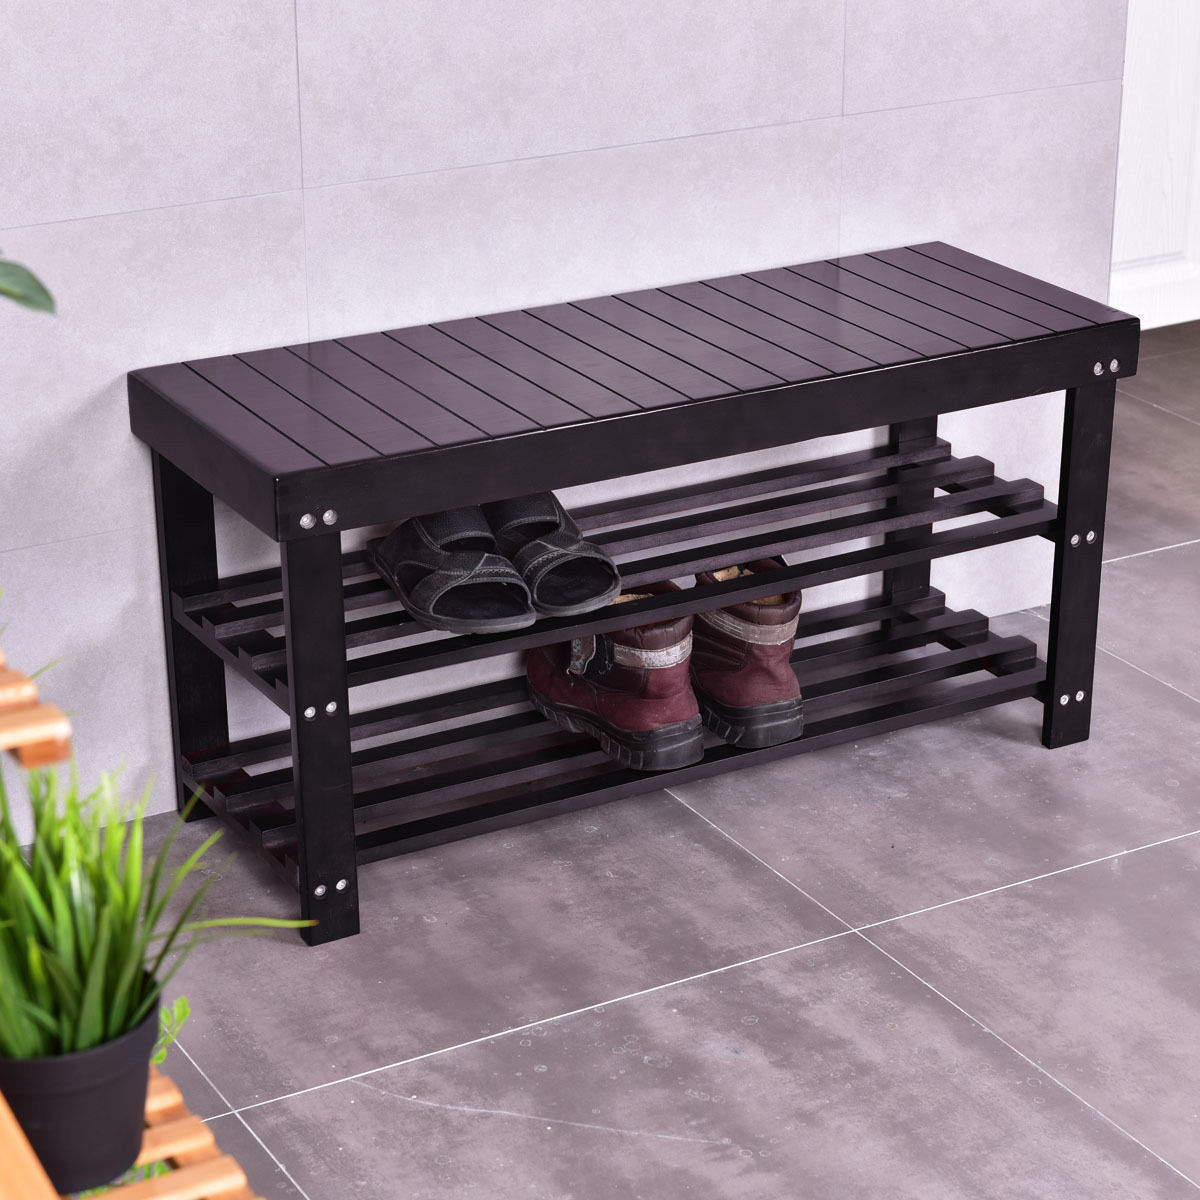 "Ktaxon 36"" Solid Wood Shoe Bench 3 Tier Storage Racks Seat Organizer Entryway Hallway Espresso"